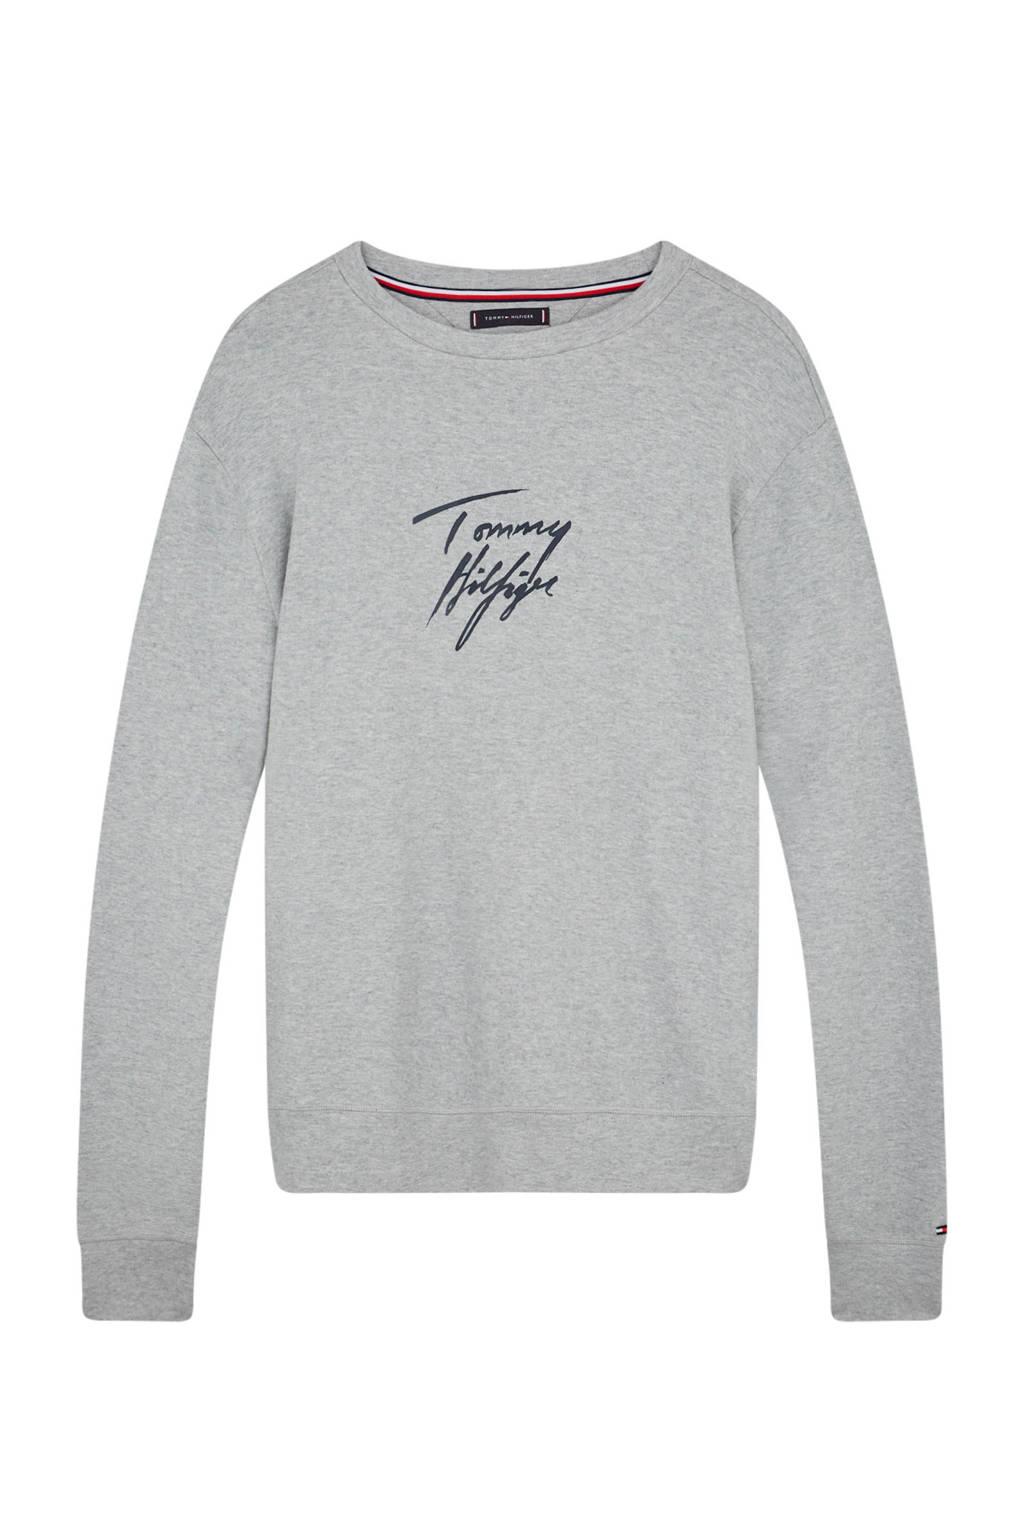 Tommy Hilfiger pyjamatop met logo grijs, Grijs